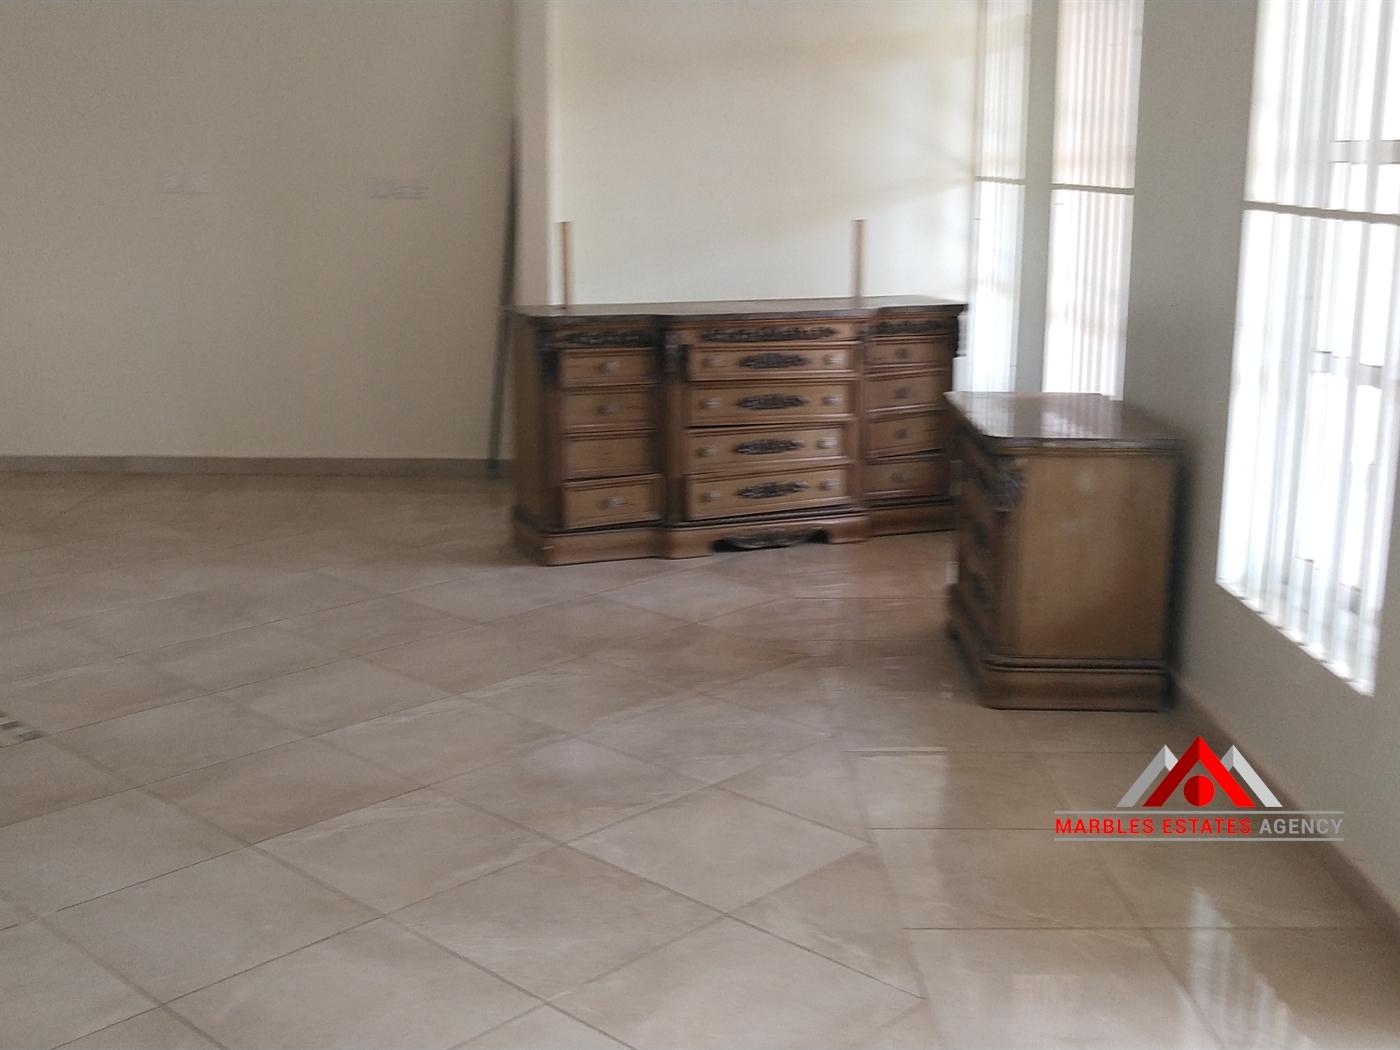 Storeyed house for rent in Naguru Kampala